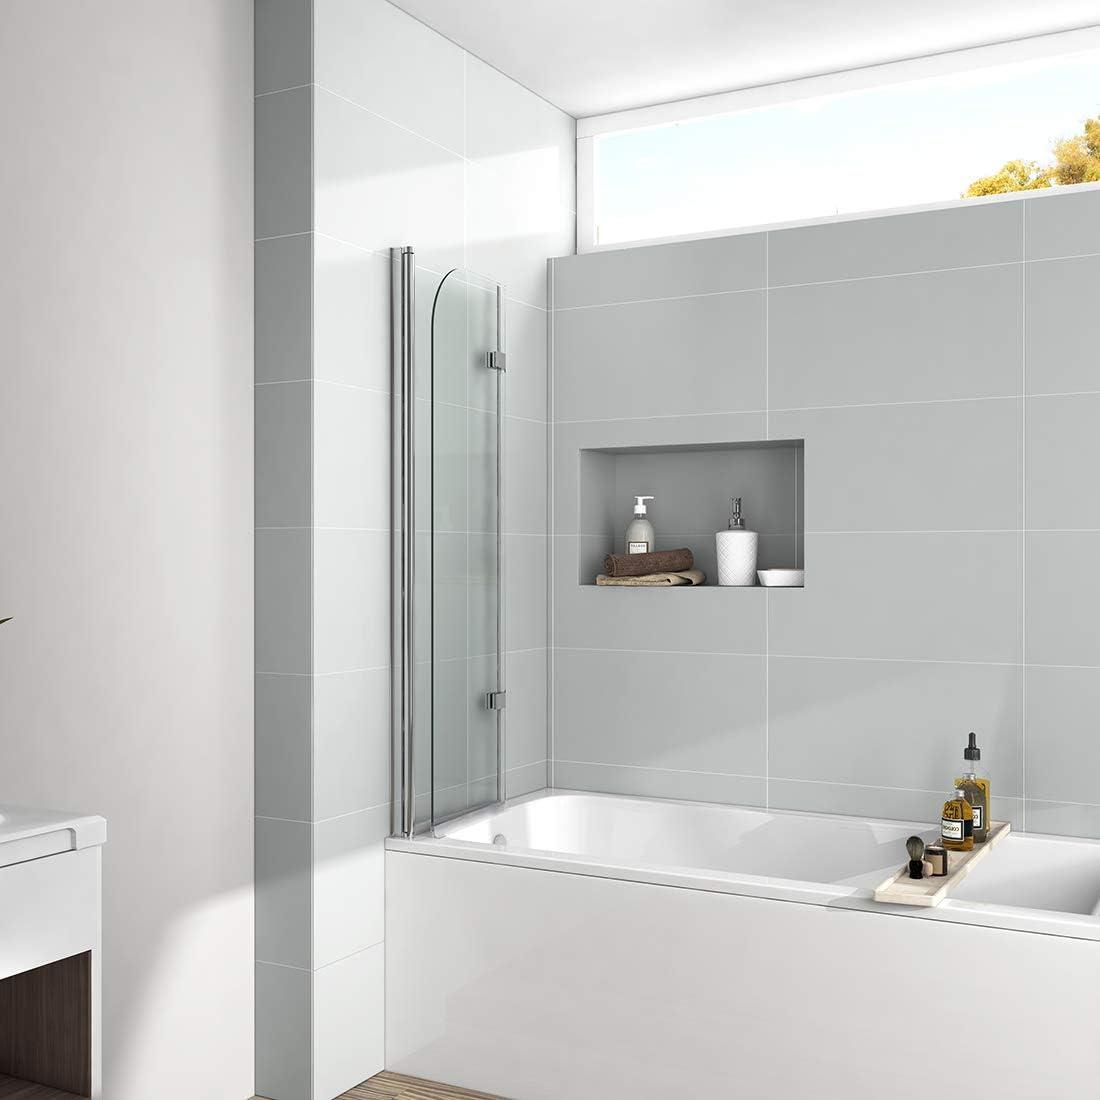 düravak bañera Mampara – Mampara plegable pared Nano – Mampara de ...